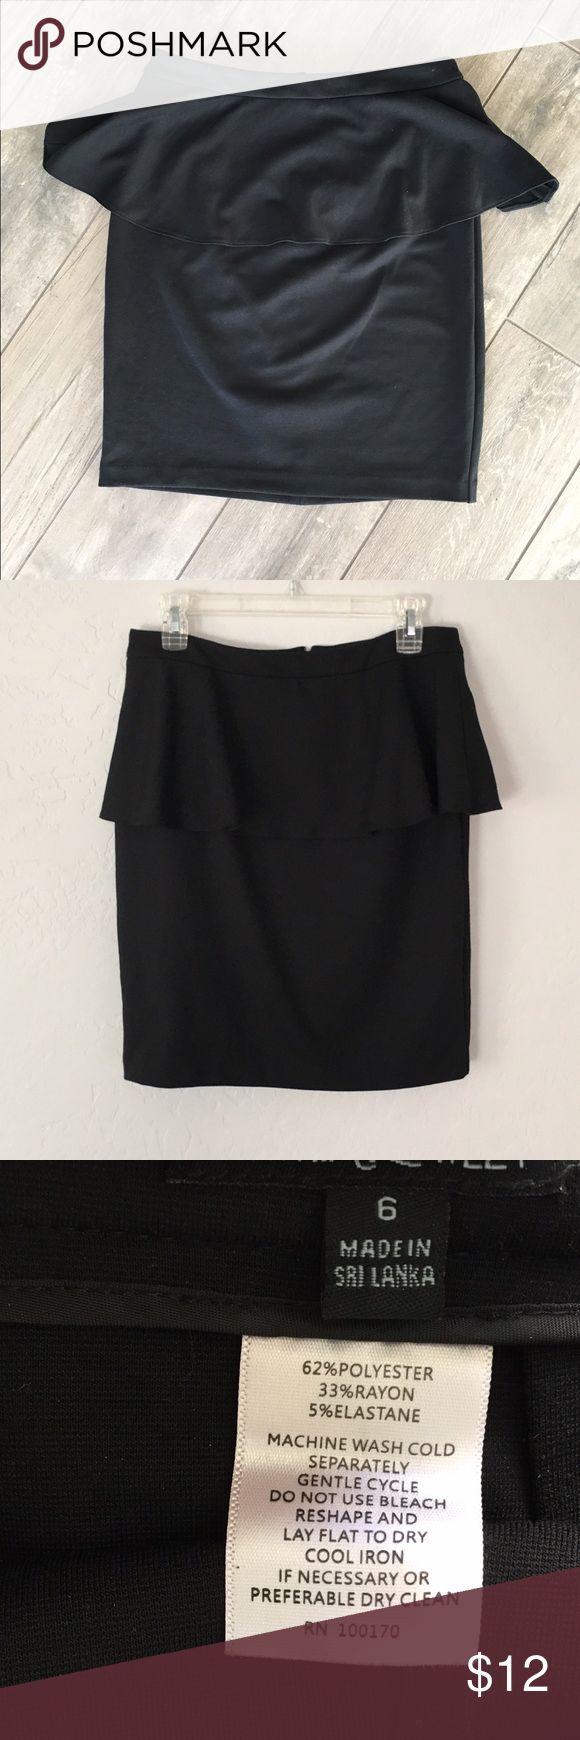 Cynthia Rowley peplum skirt Classic black peplum style skirt. Black zipper. Great thickness and not see through at all! Cynthia Rowley Skirts Midi